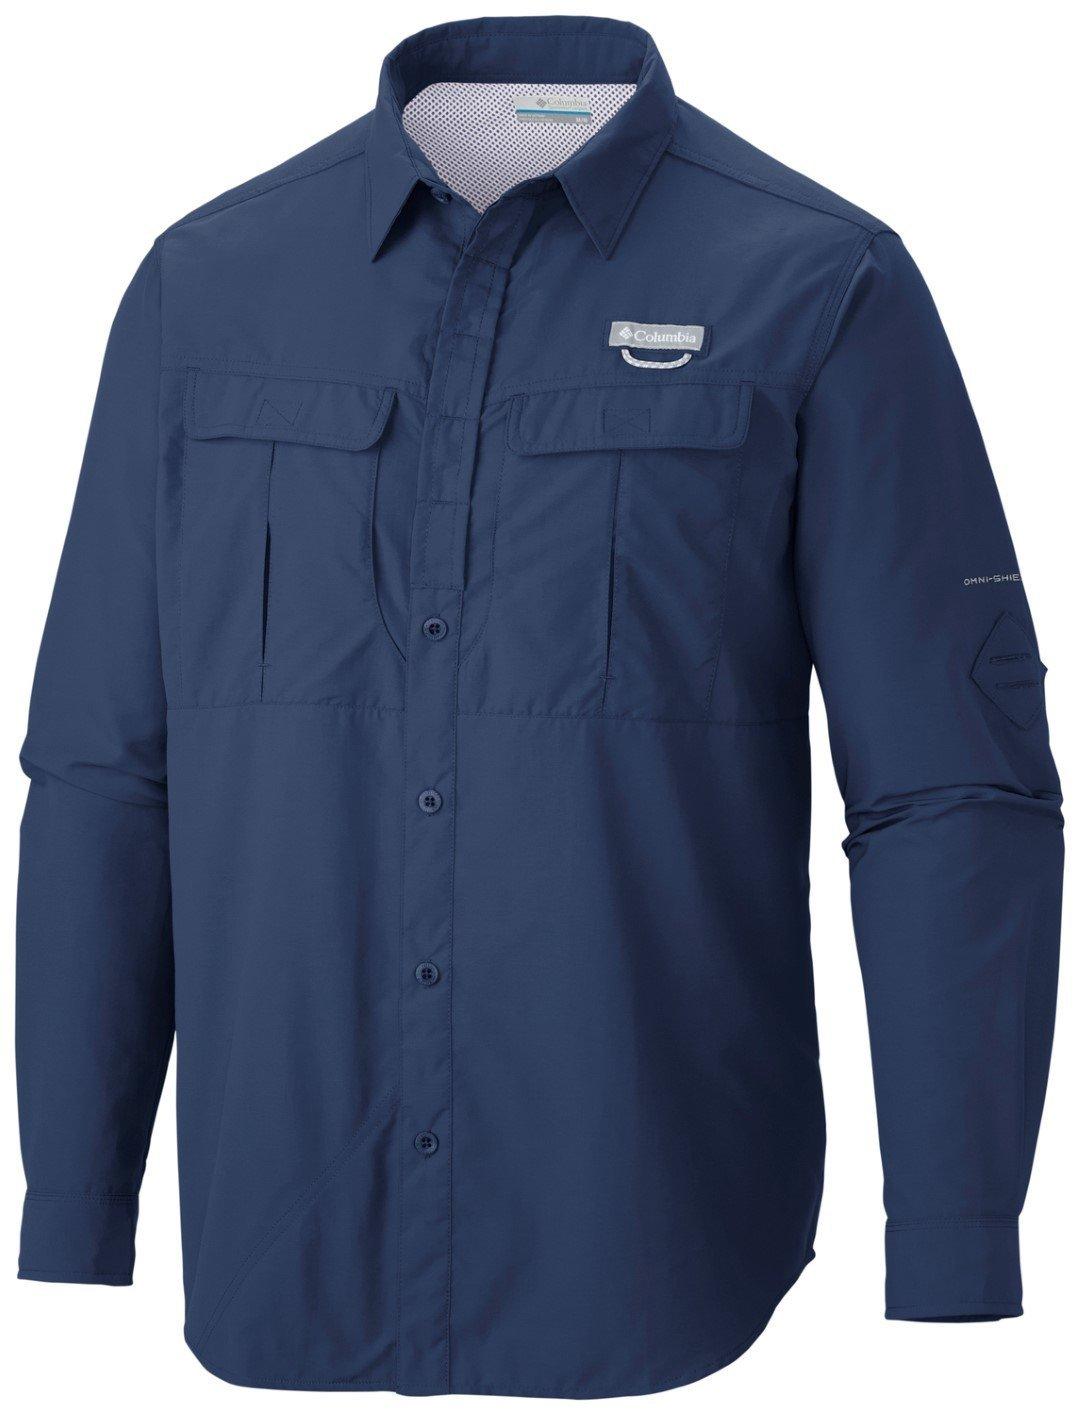 Columbia Shirt, Langarm-Wanderhemd für Herren, Cascades Explorer Long Sleeve Shirt, Columbia Nylon fa244f